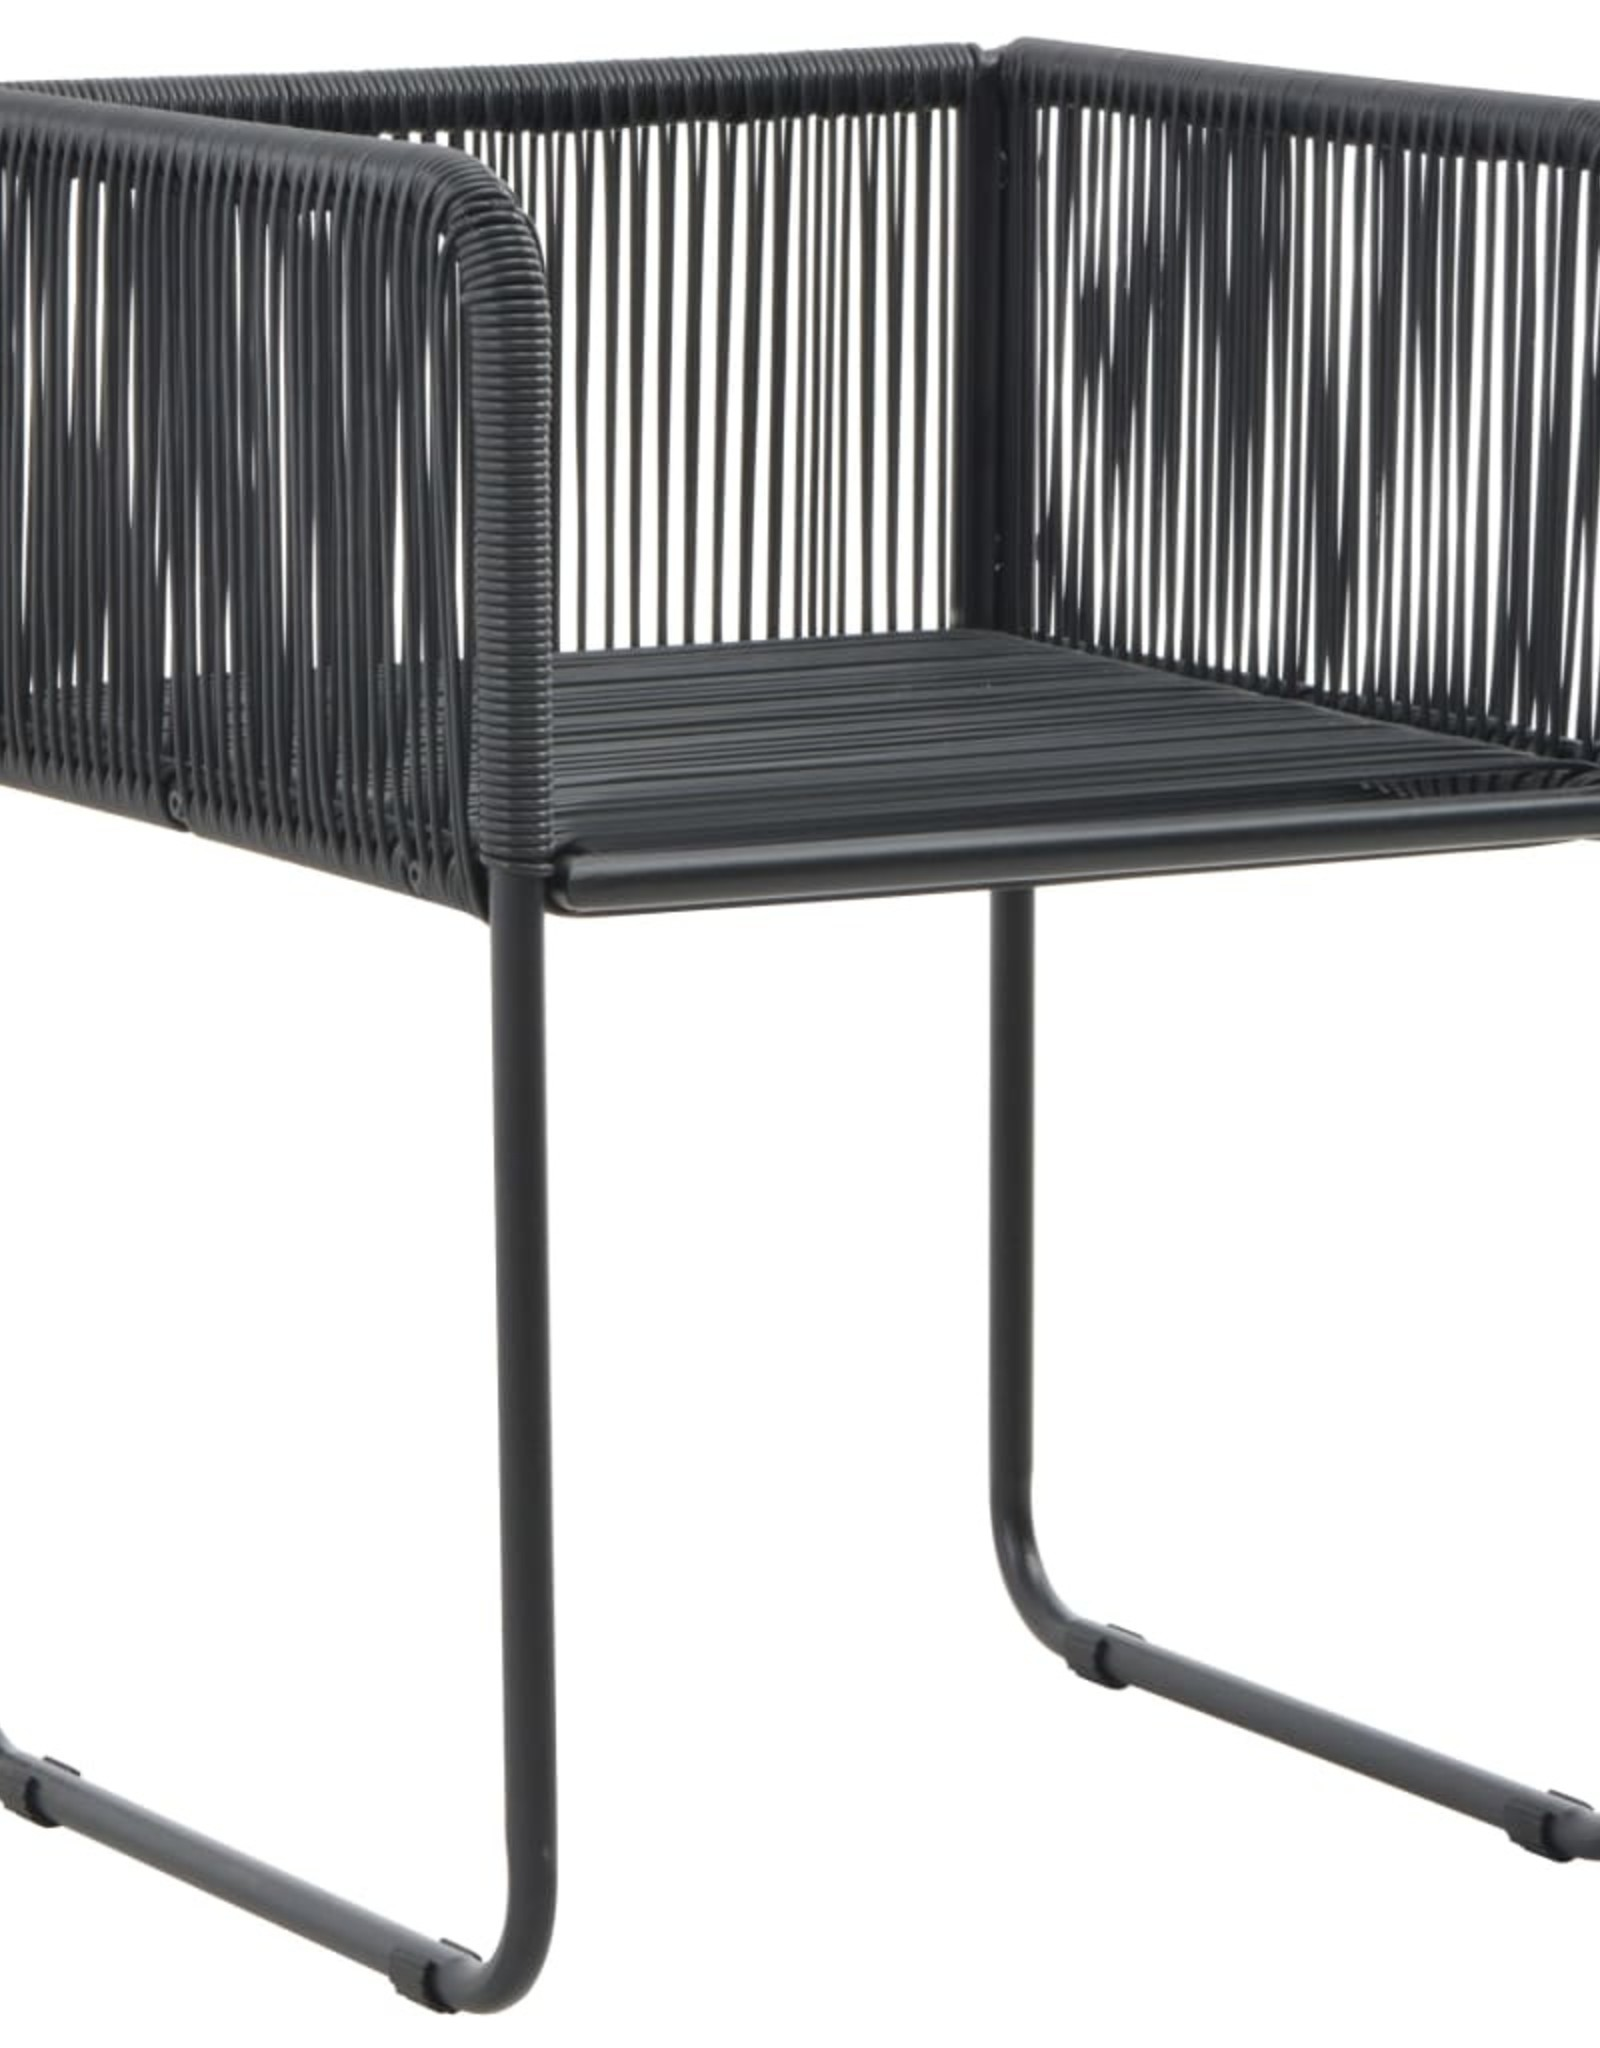 3-delige Tuinset PVC-rattan zwart